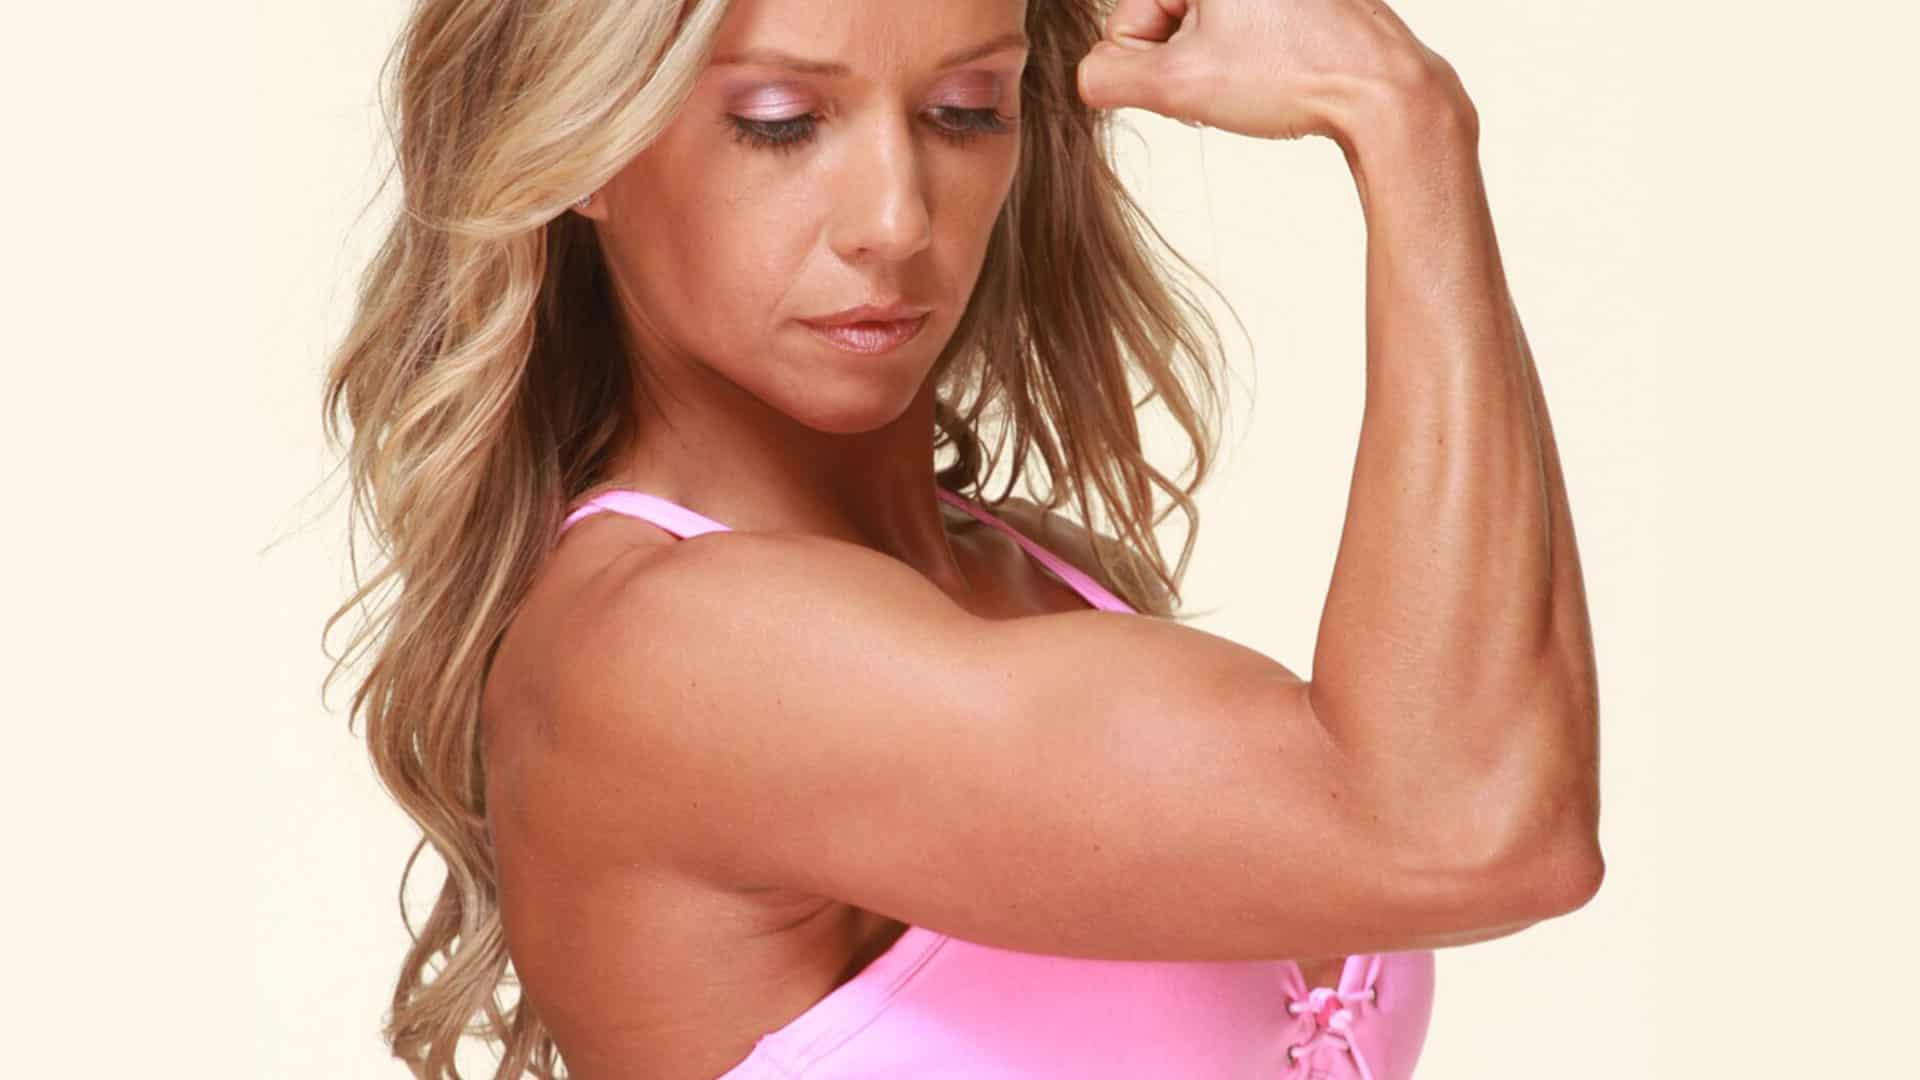 Toning Biceps & Triceps (Video)